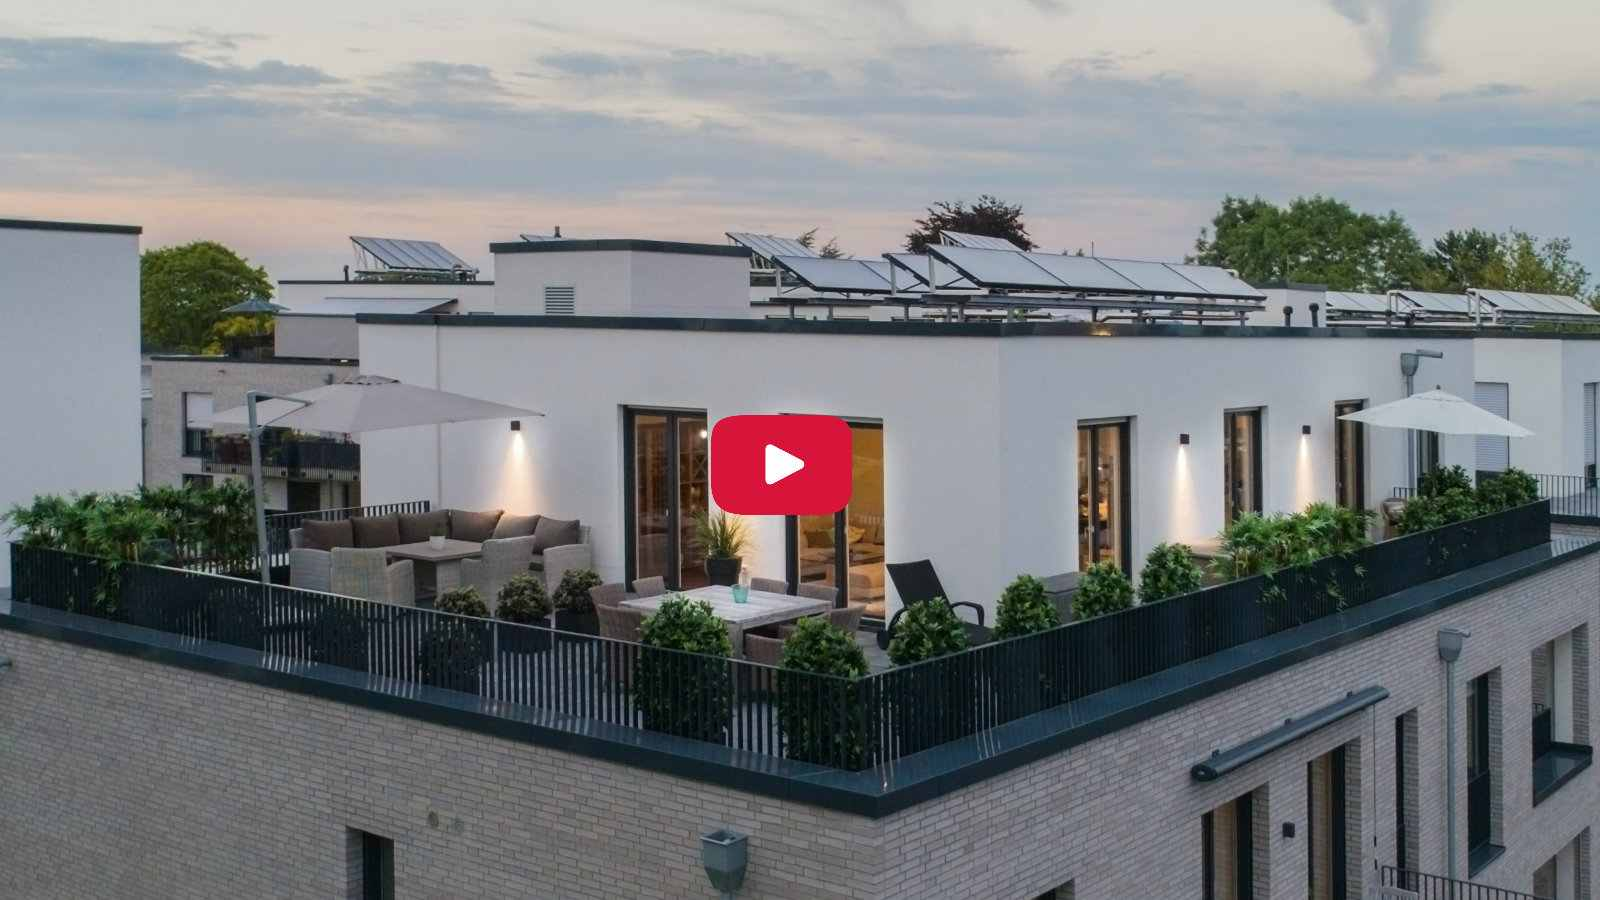 Video Imagefilm mit Drohne Symbolbild